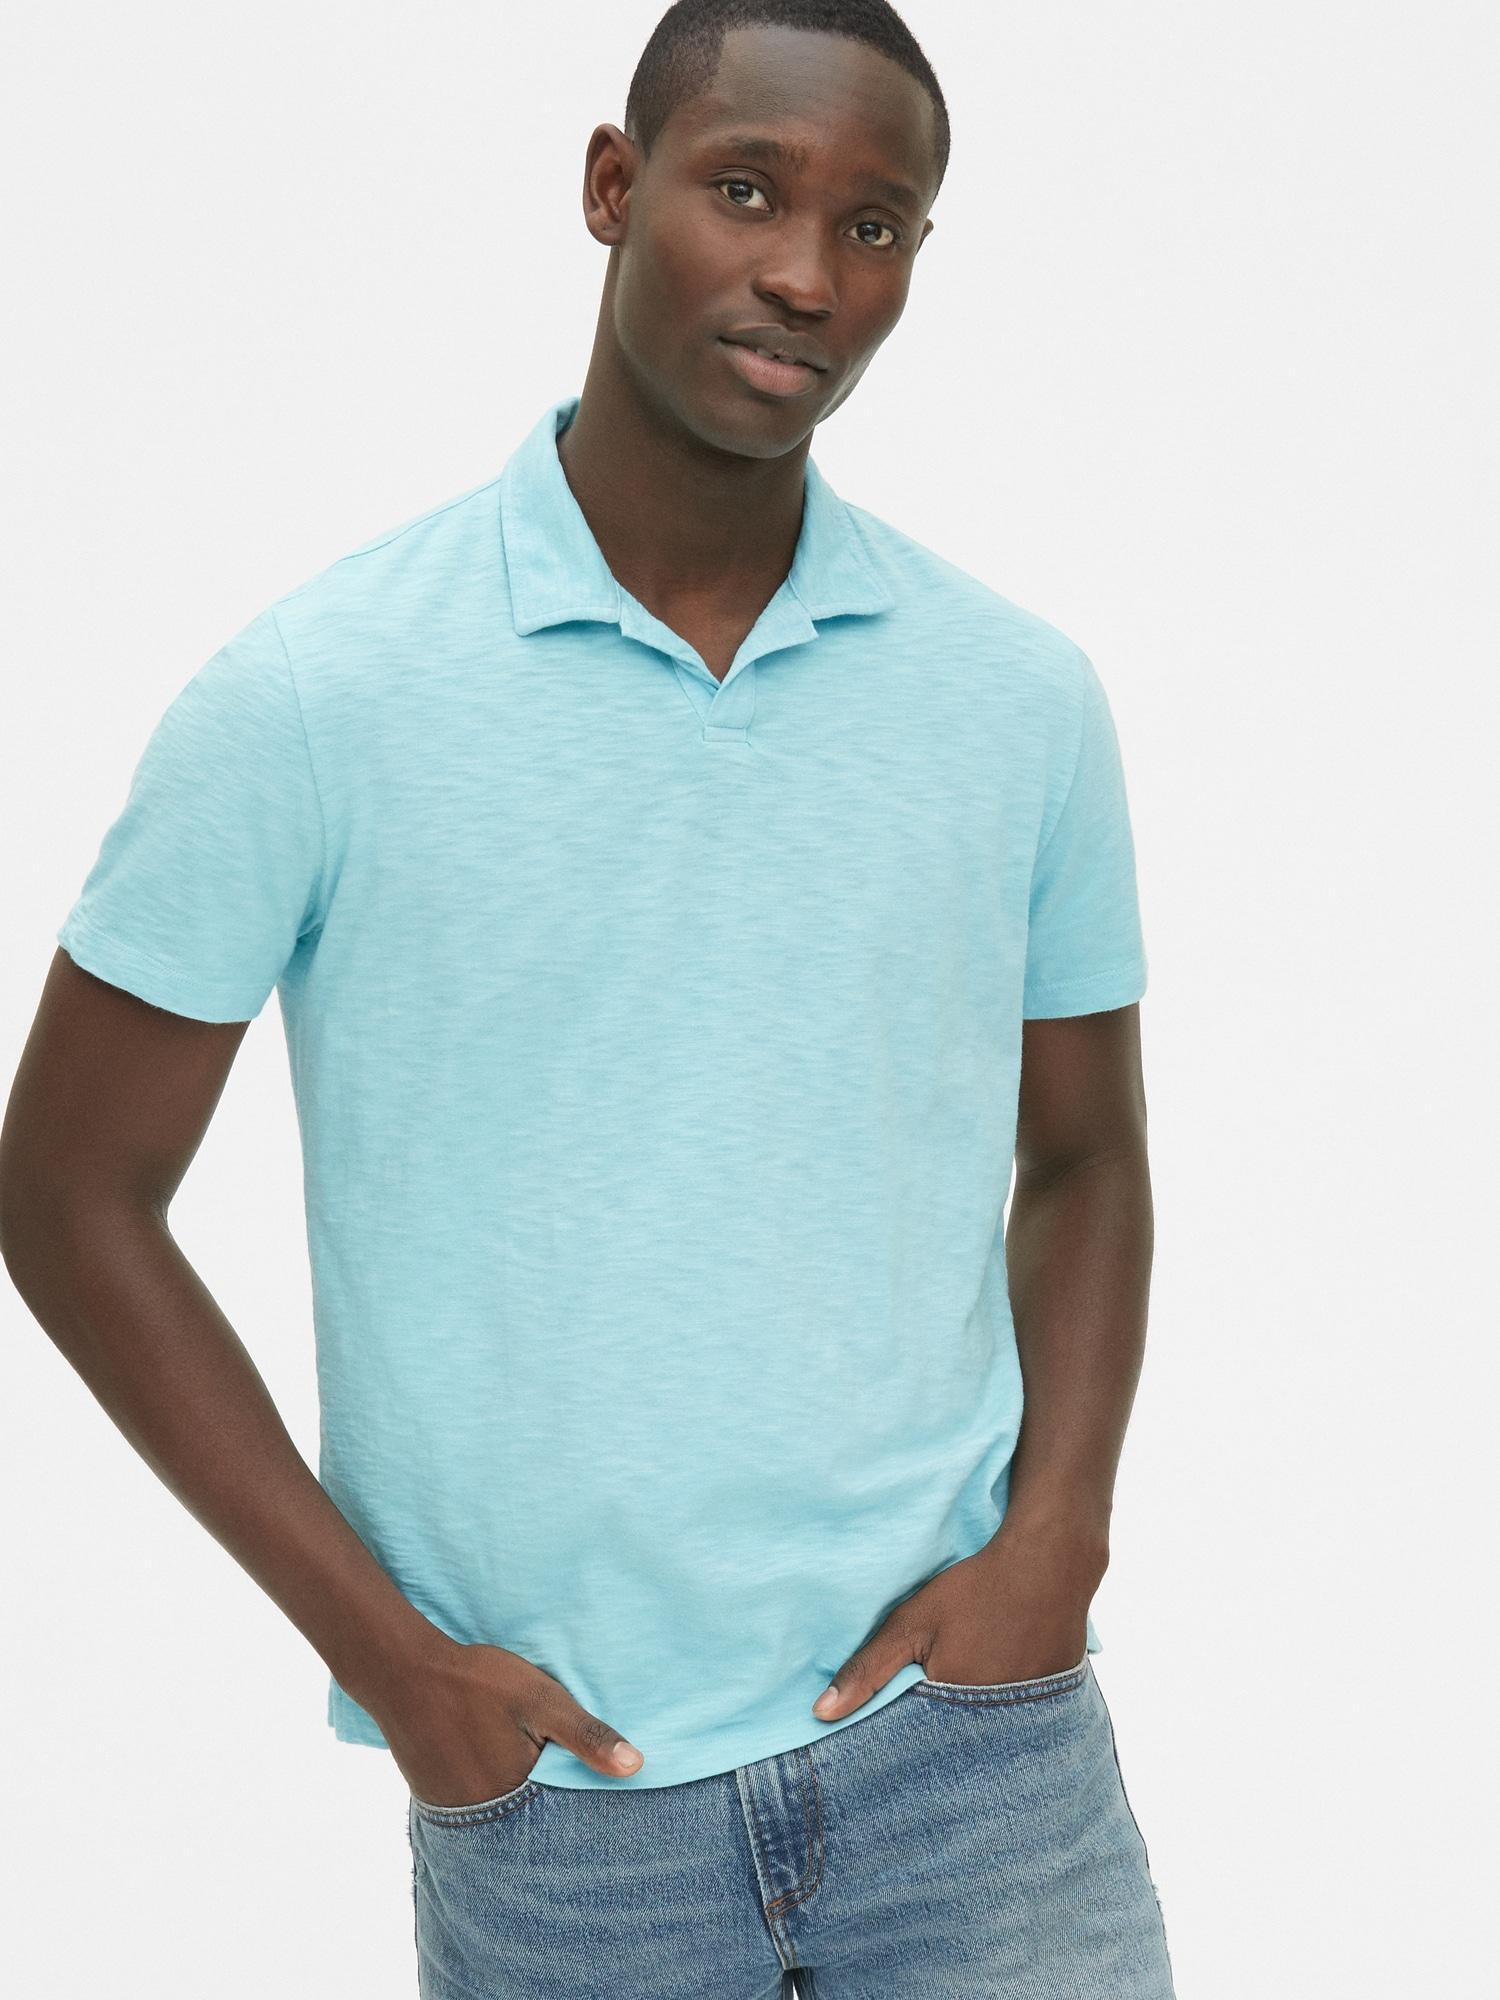 db0e1df19 Lyst - Gap Slub Jersey Polo Shirt in Blue for Men